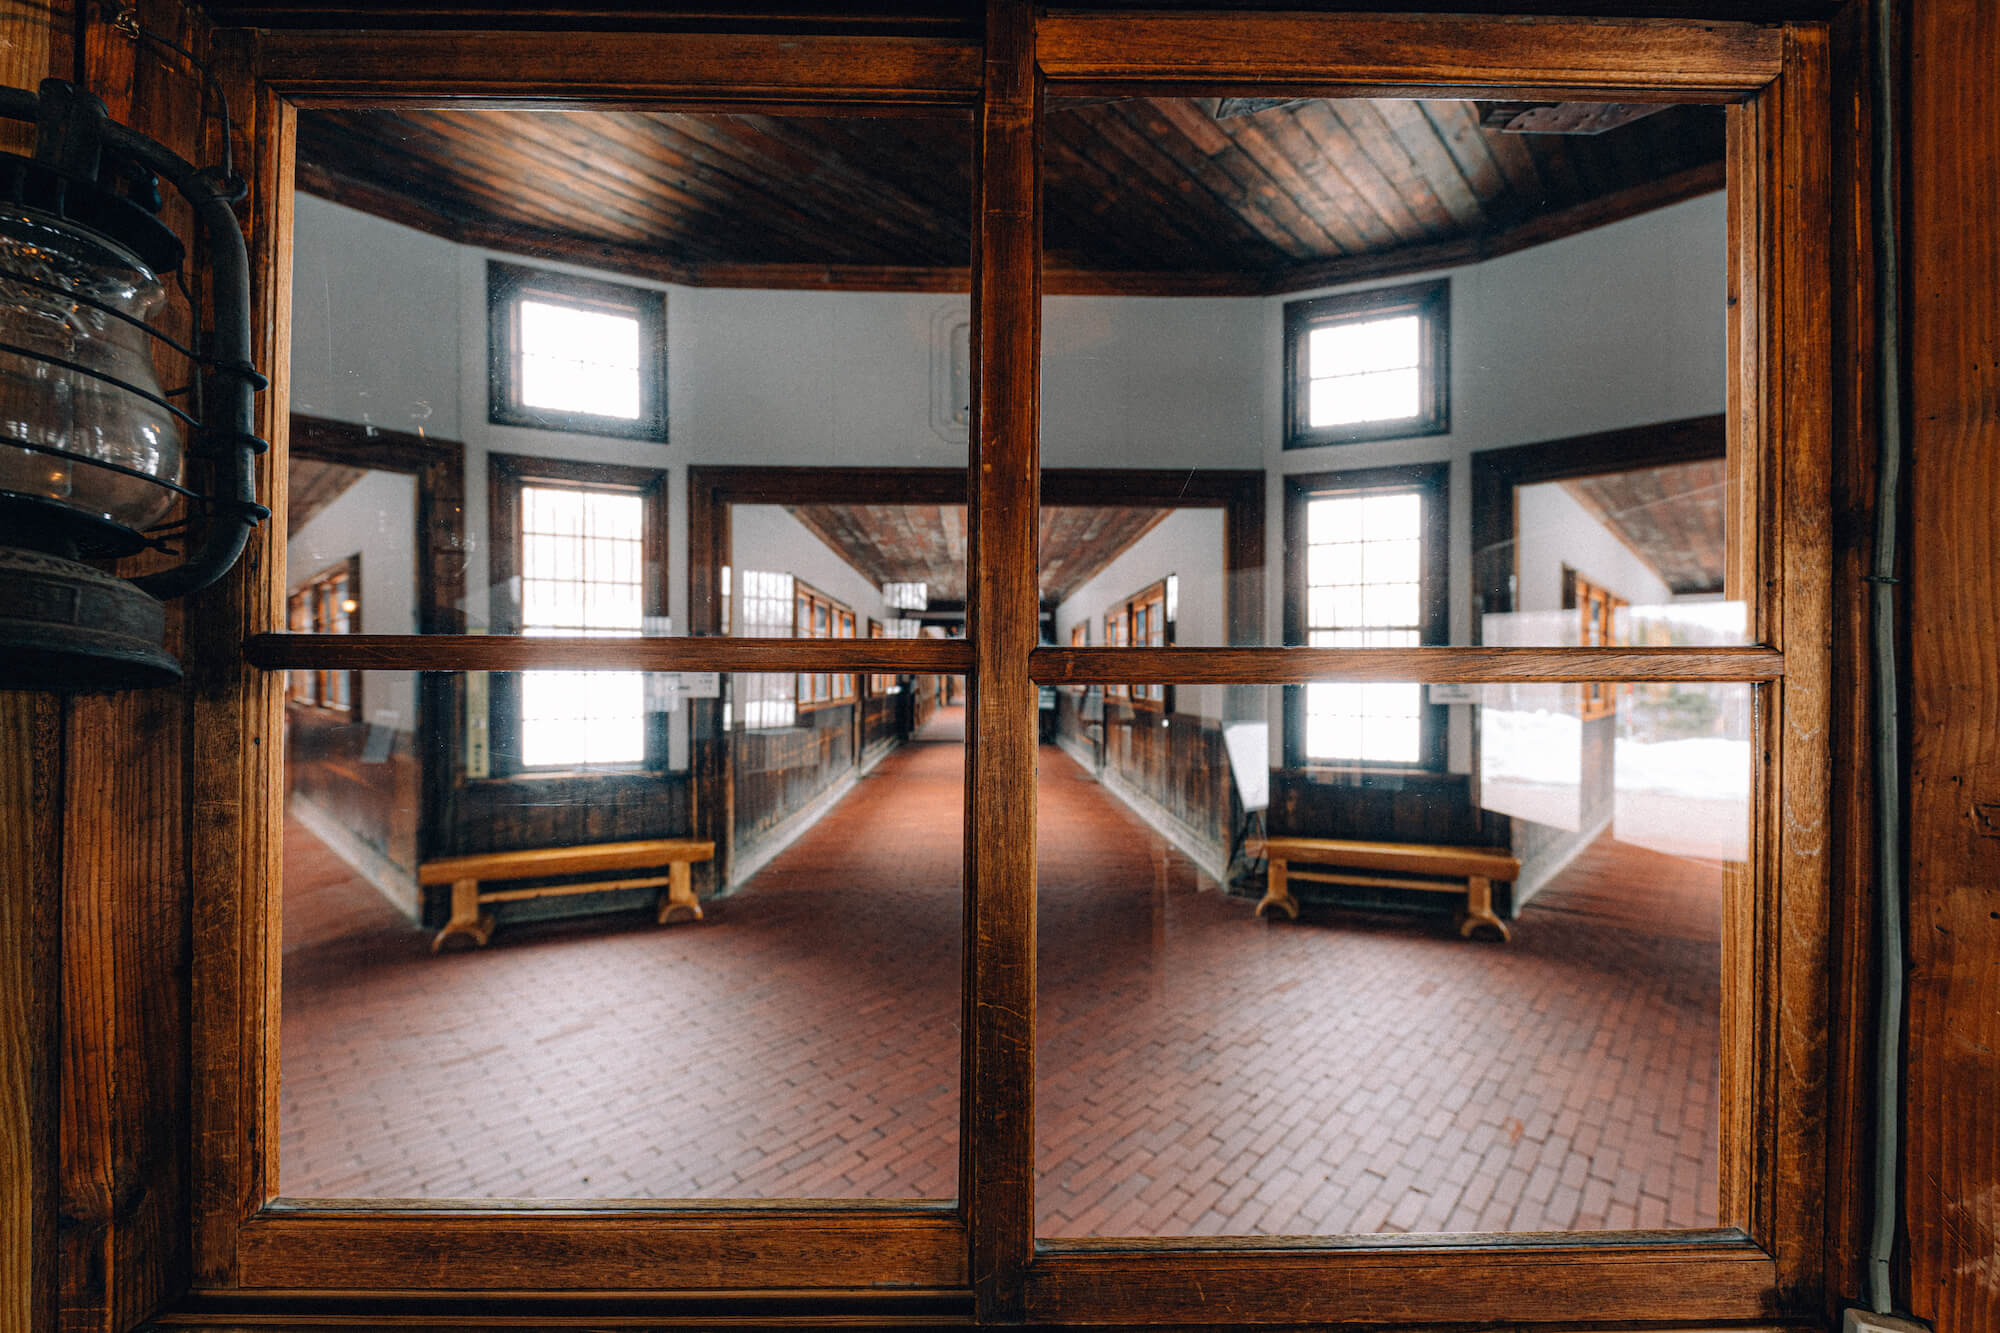 博物館「網走監獄」の見学